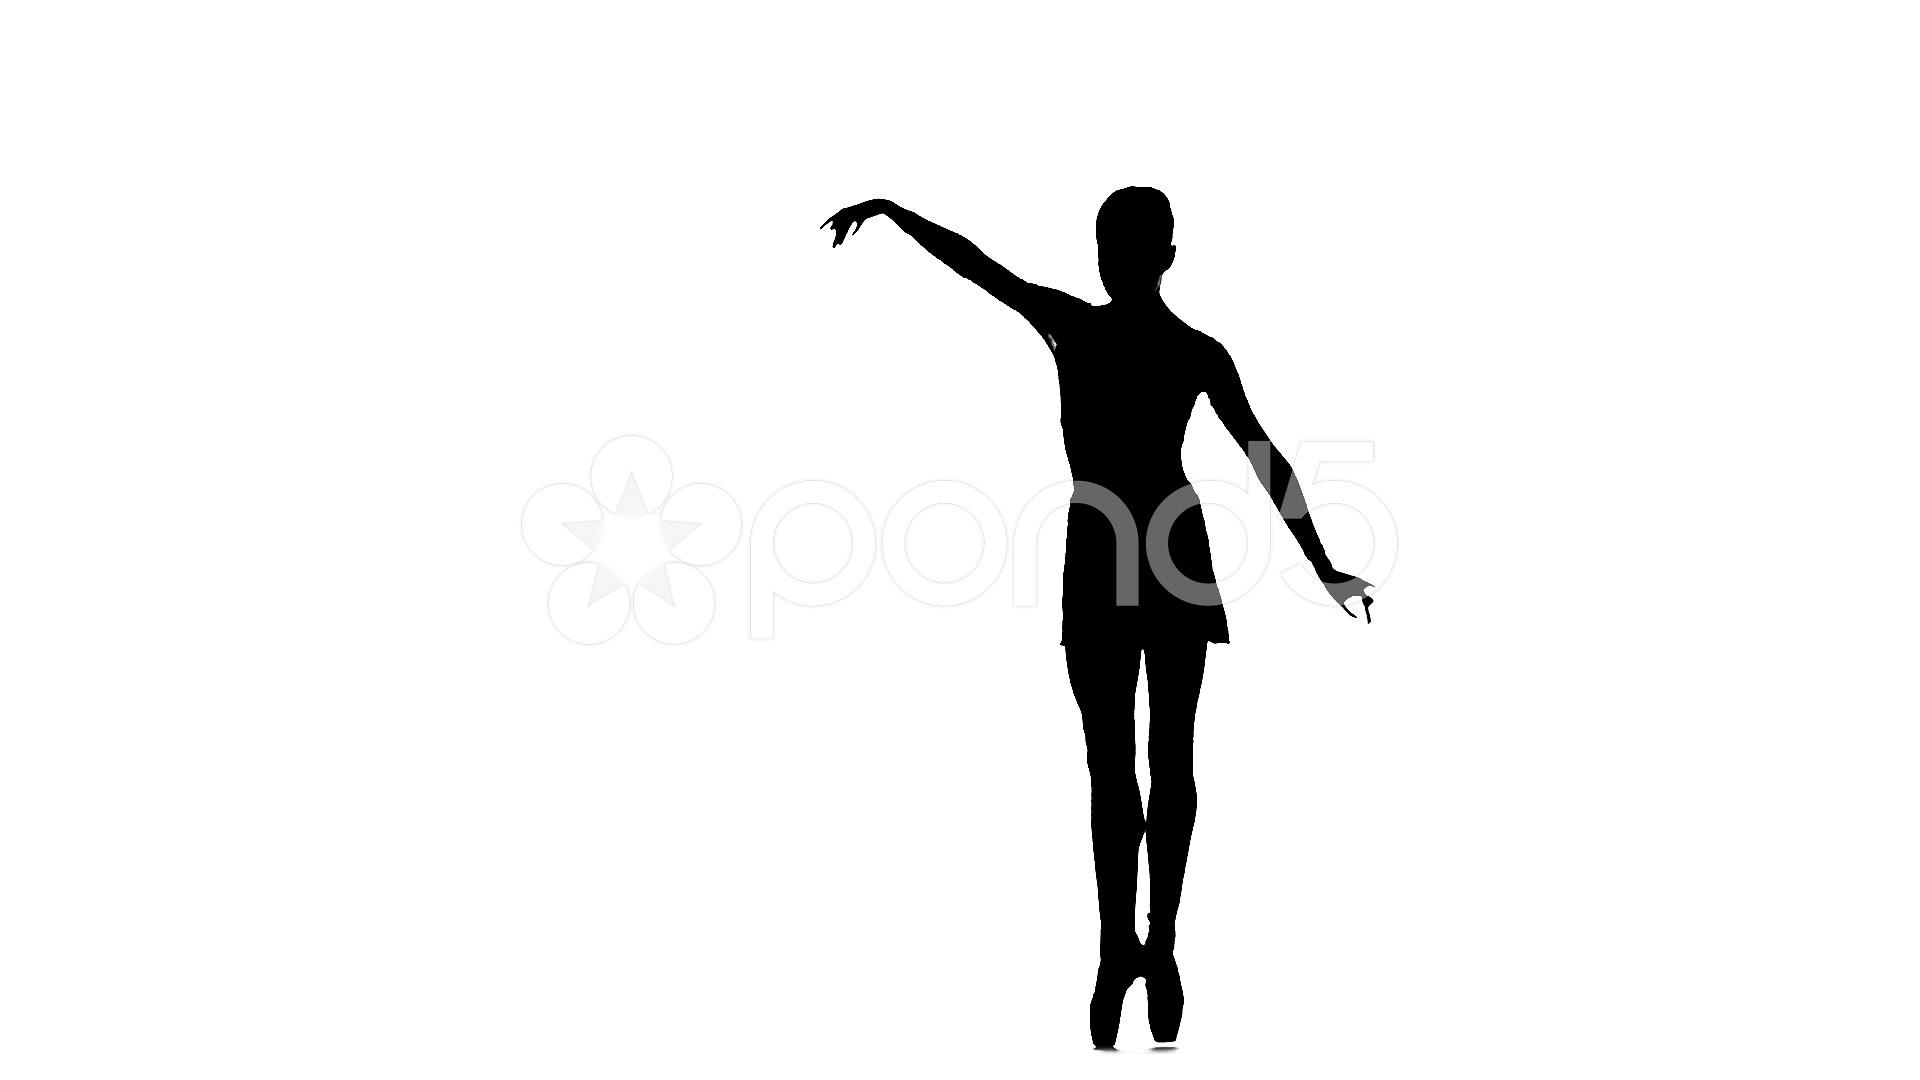 1920x1080 Little Ballerina Girl Posing On A White Background. Silhouette